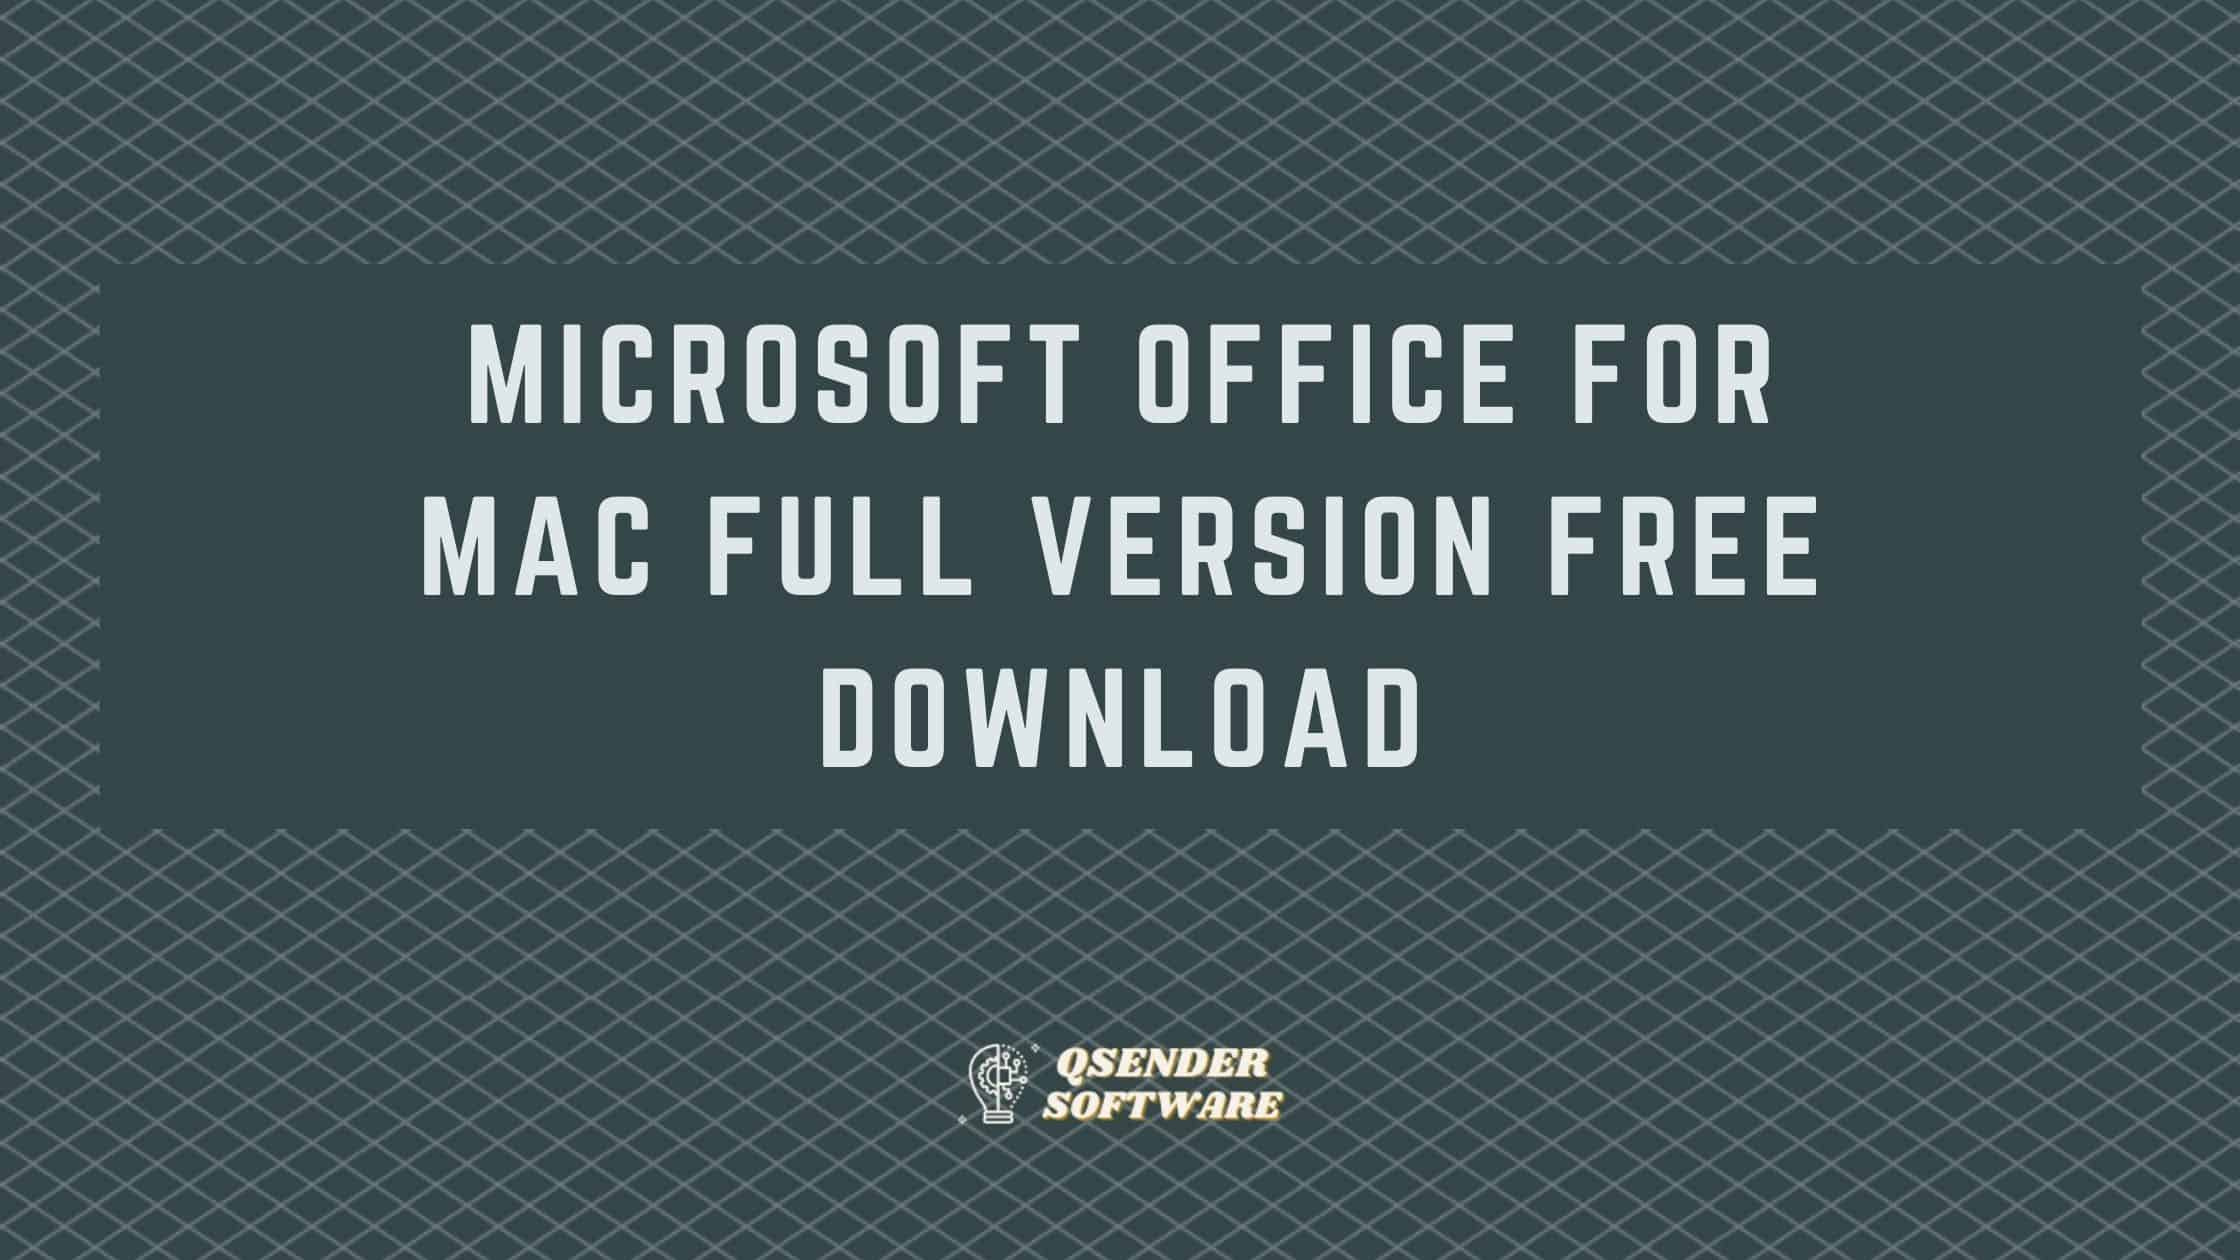 Microsoft Office for Mac Full Version